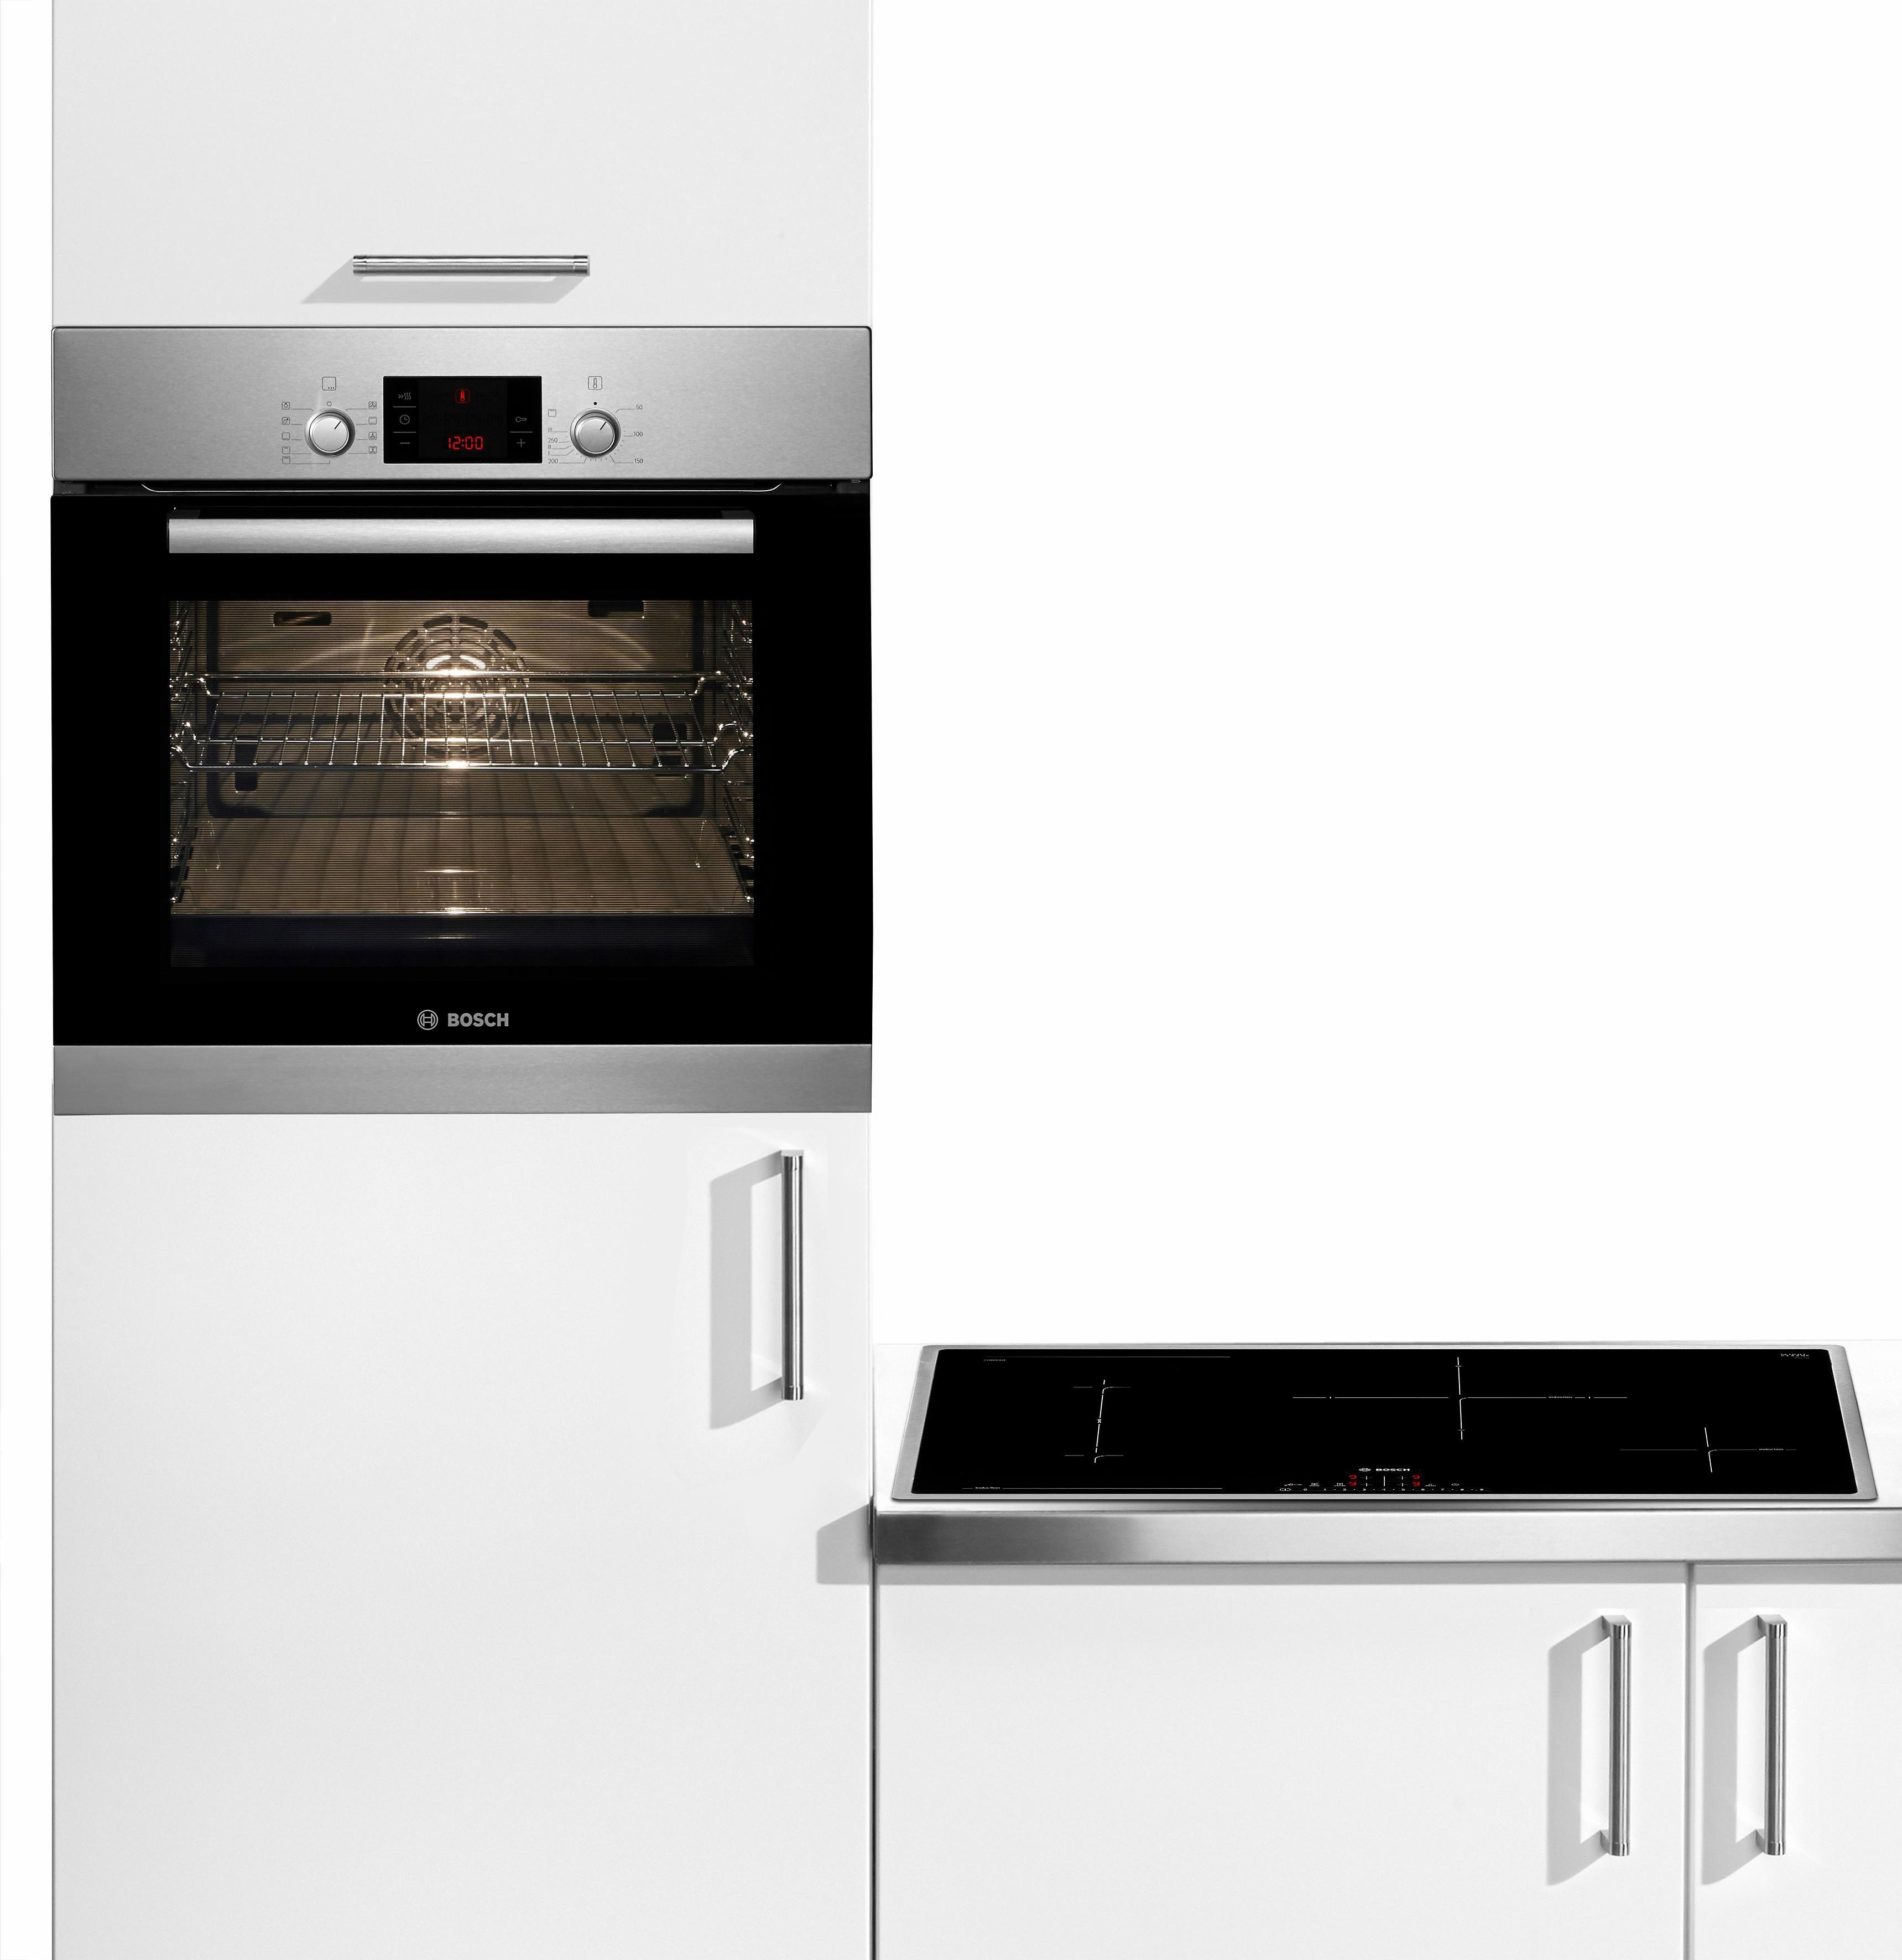 Bosch Flex-Induktions-Backofen-Set HBD38PC51, Energieklasse A